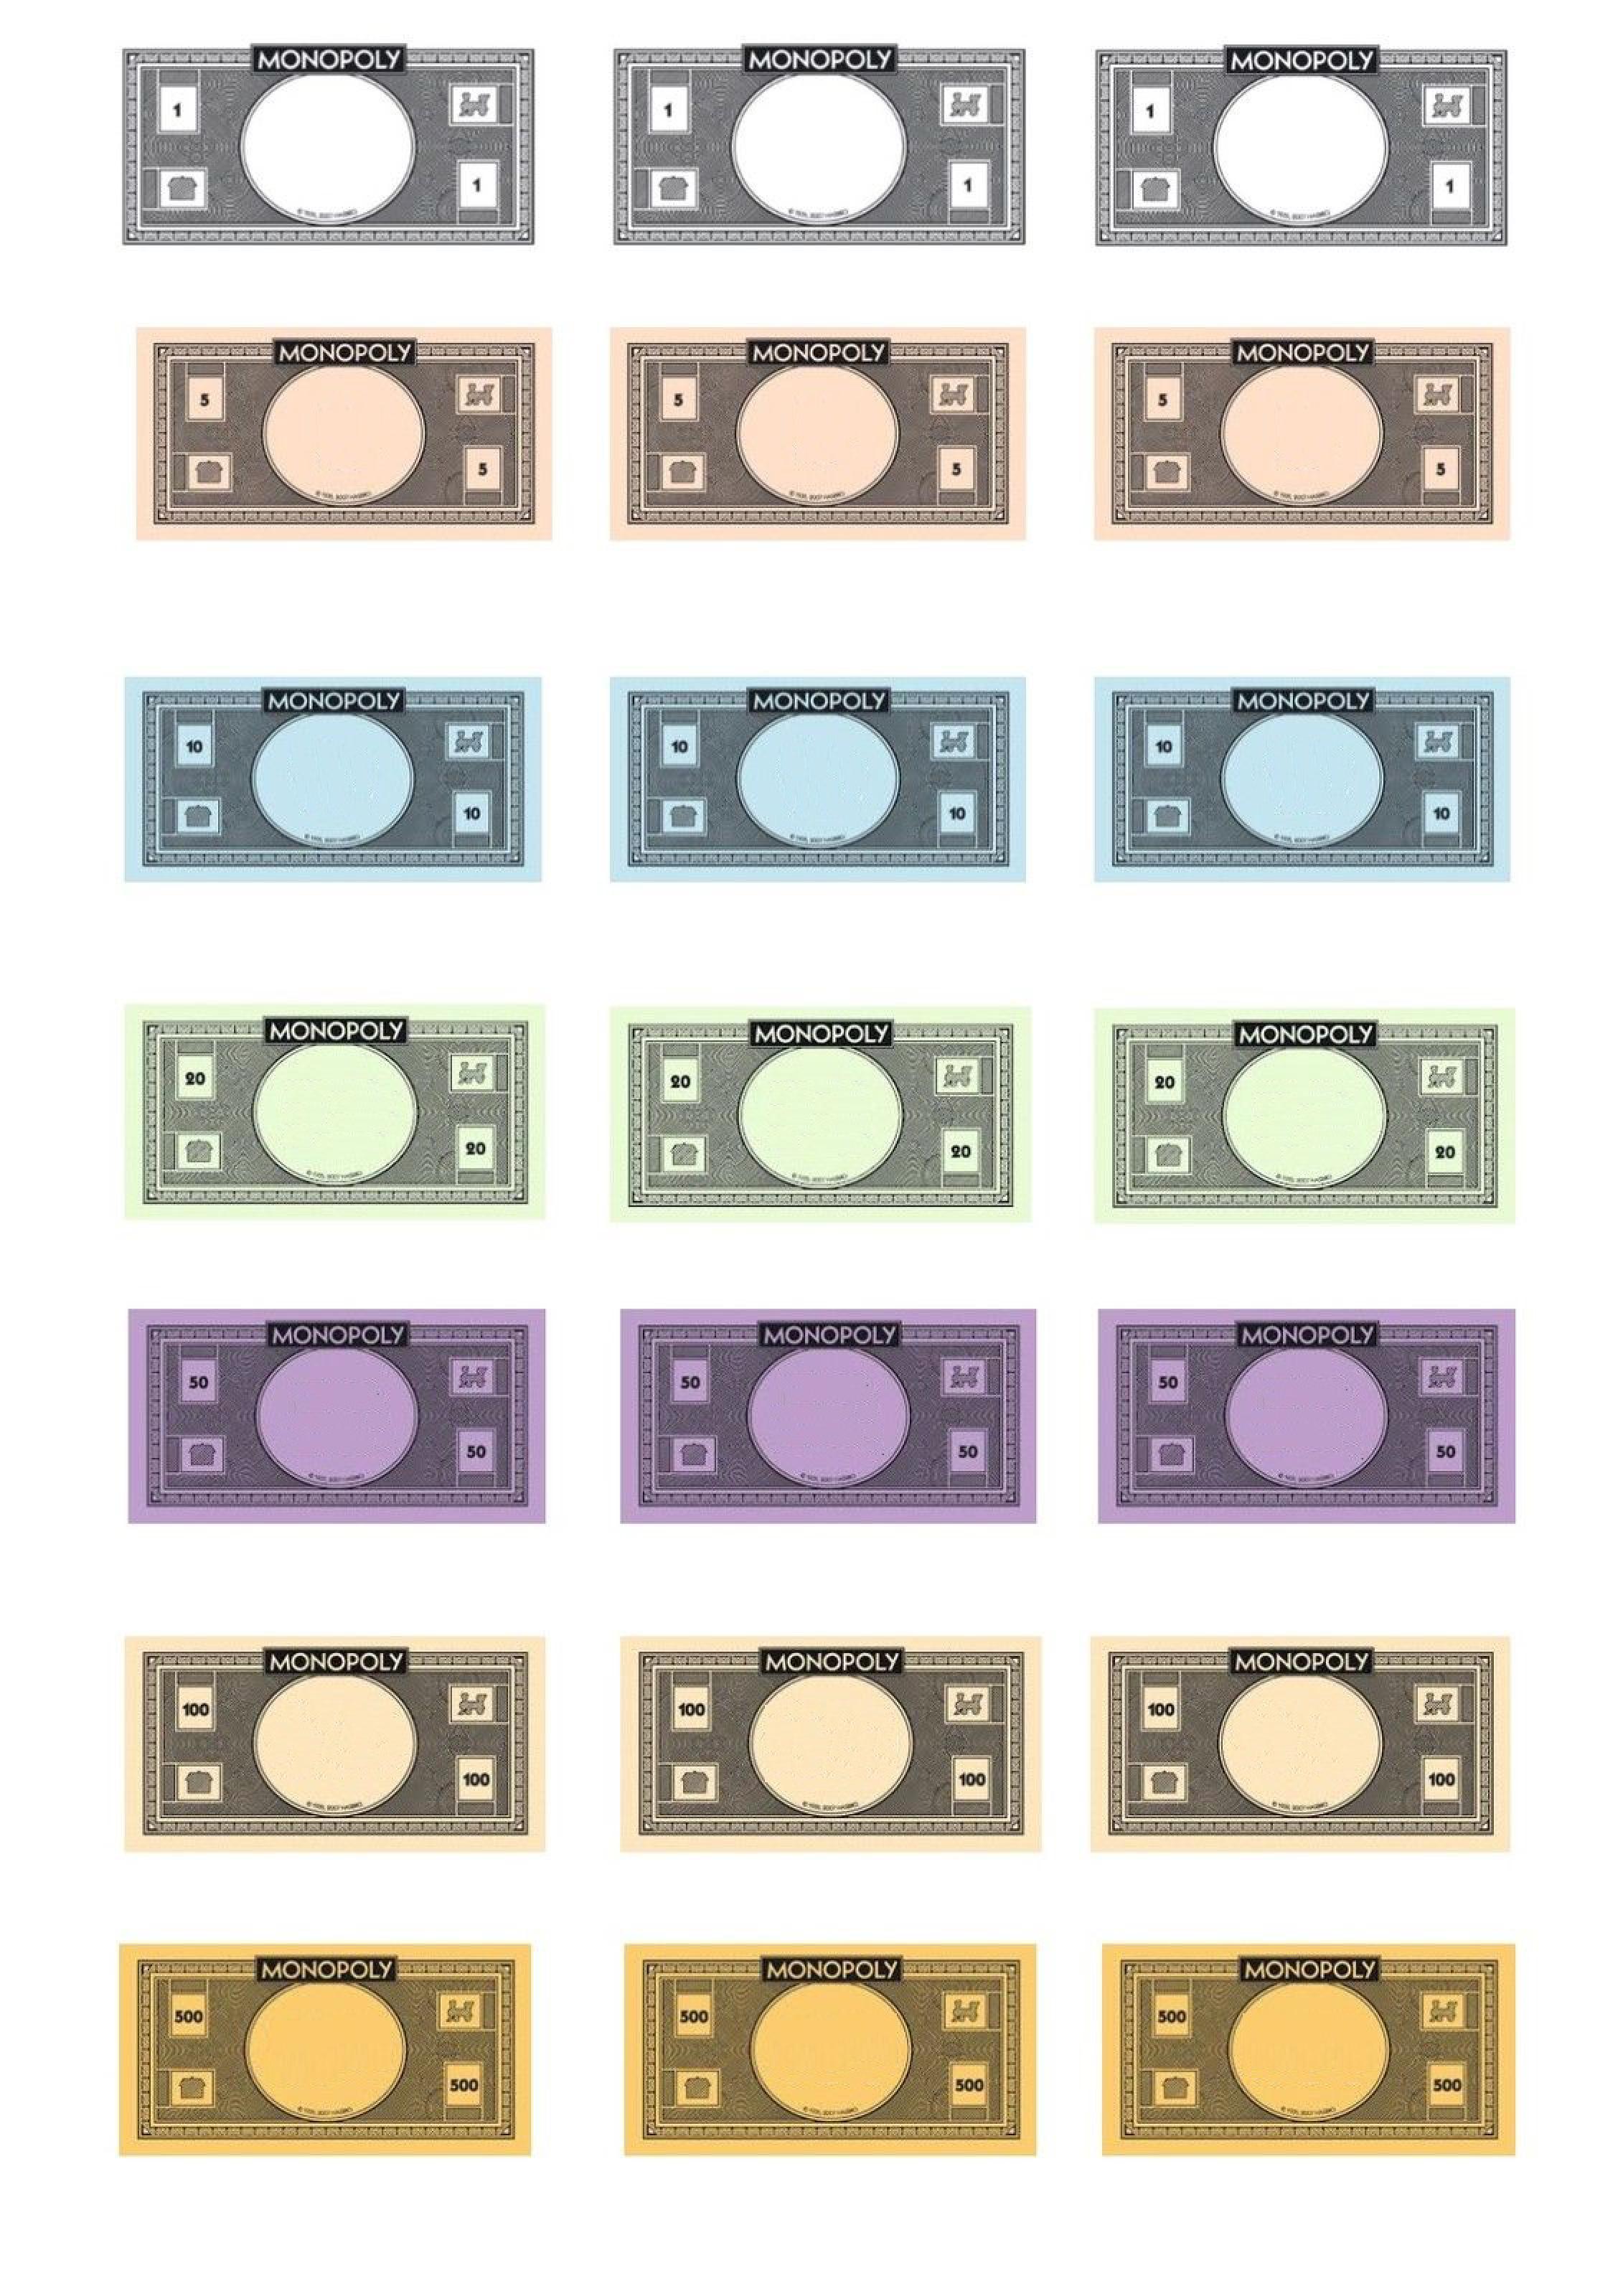 Monopoly Geld Drucken Pdf : monopoly, drucken, Monopoly, Money, Looking, Editable, Space, Face?, Download, Mo…, Template,, Printable, Money,